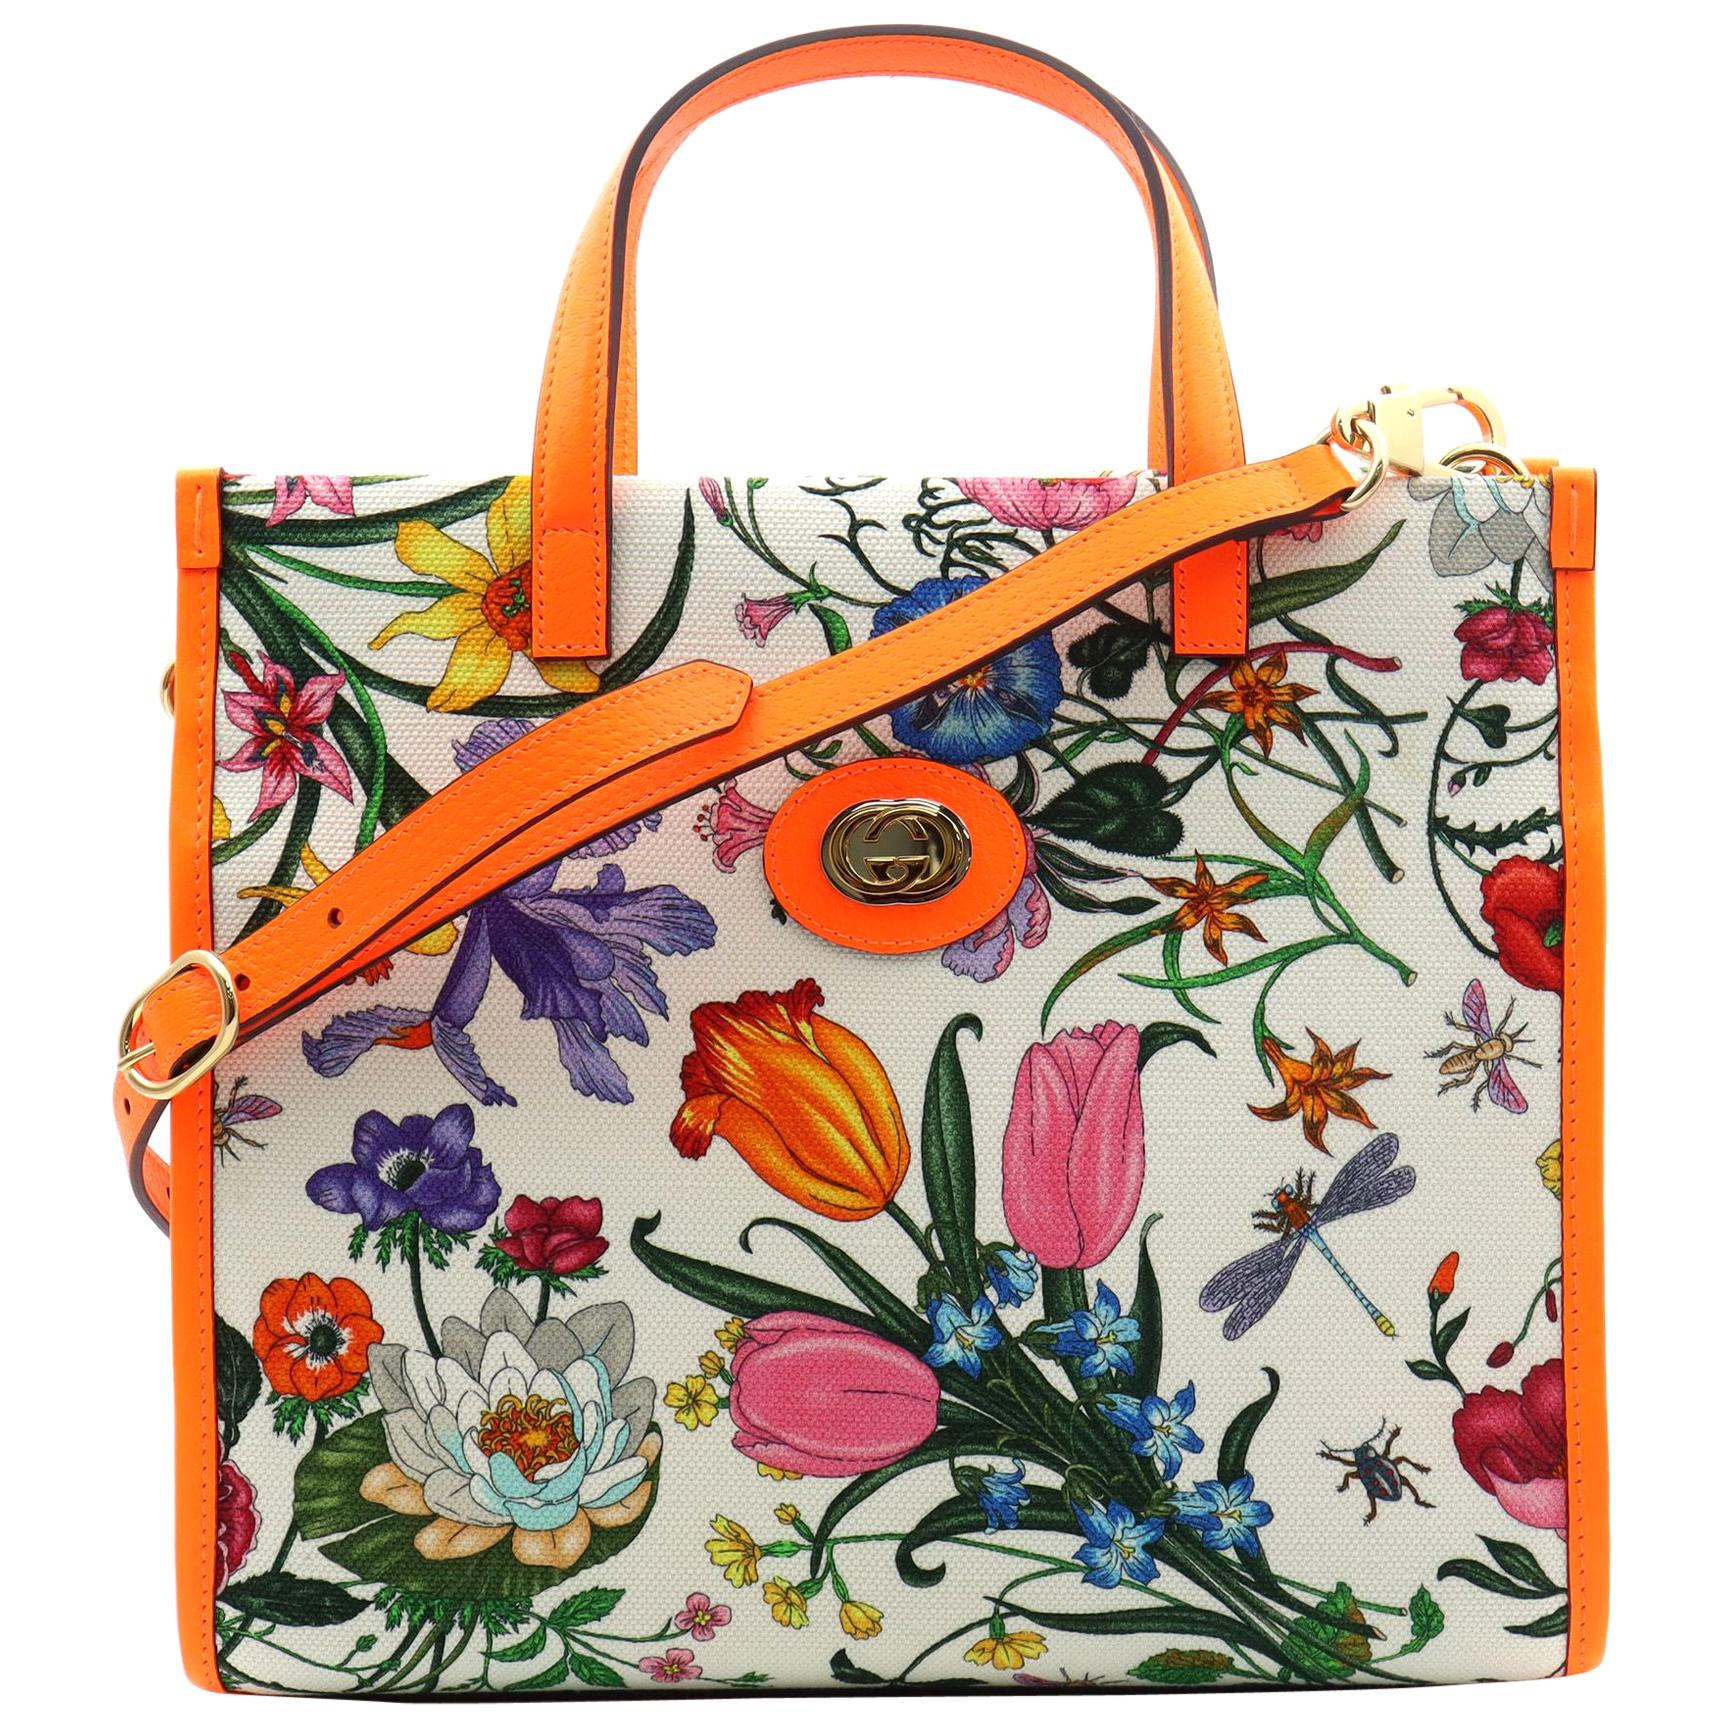 Gucci Floral Medium Orange Leather Trimmed Printed Canvas Tote Bag